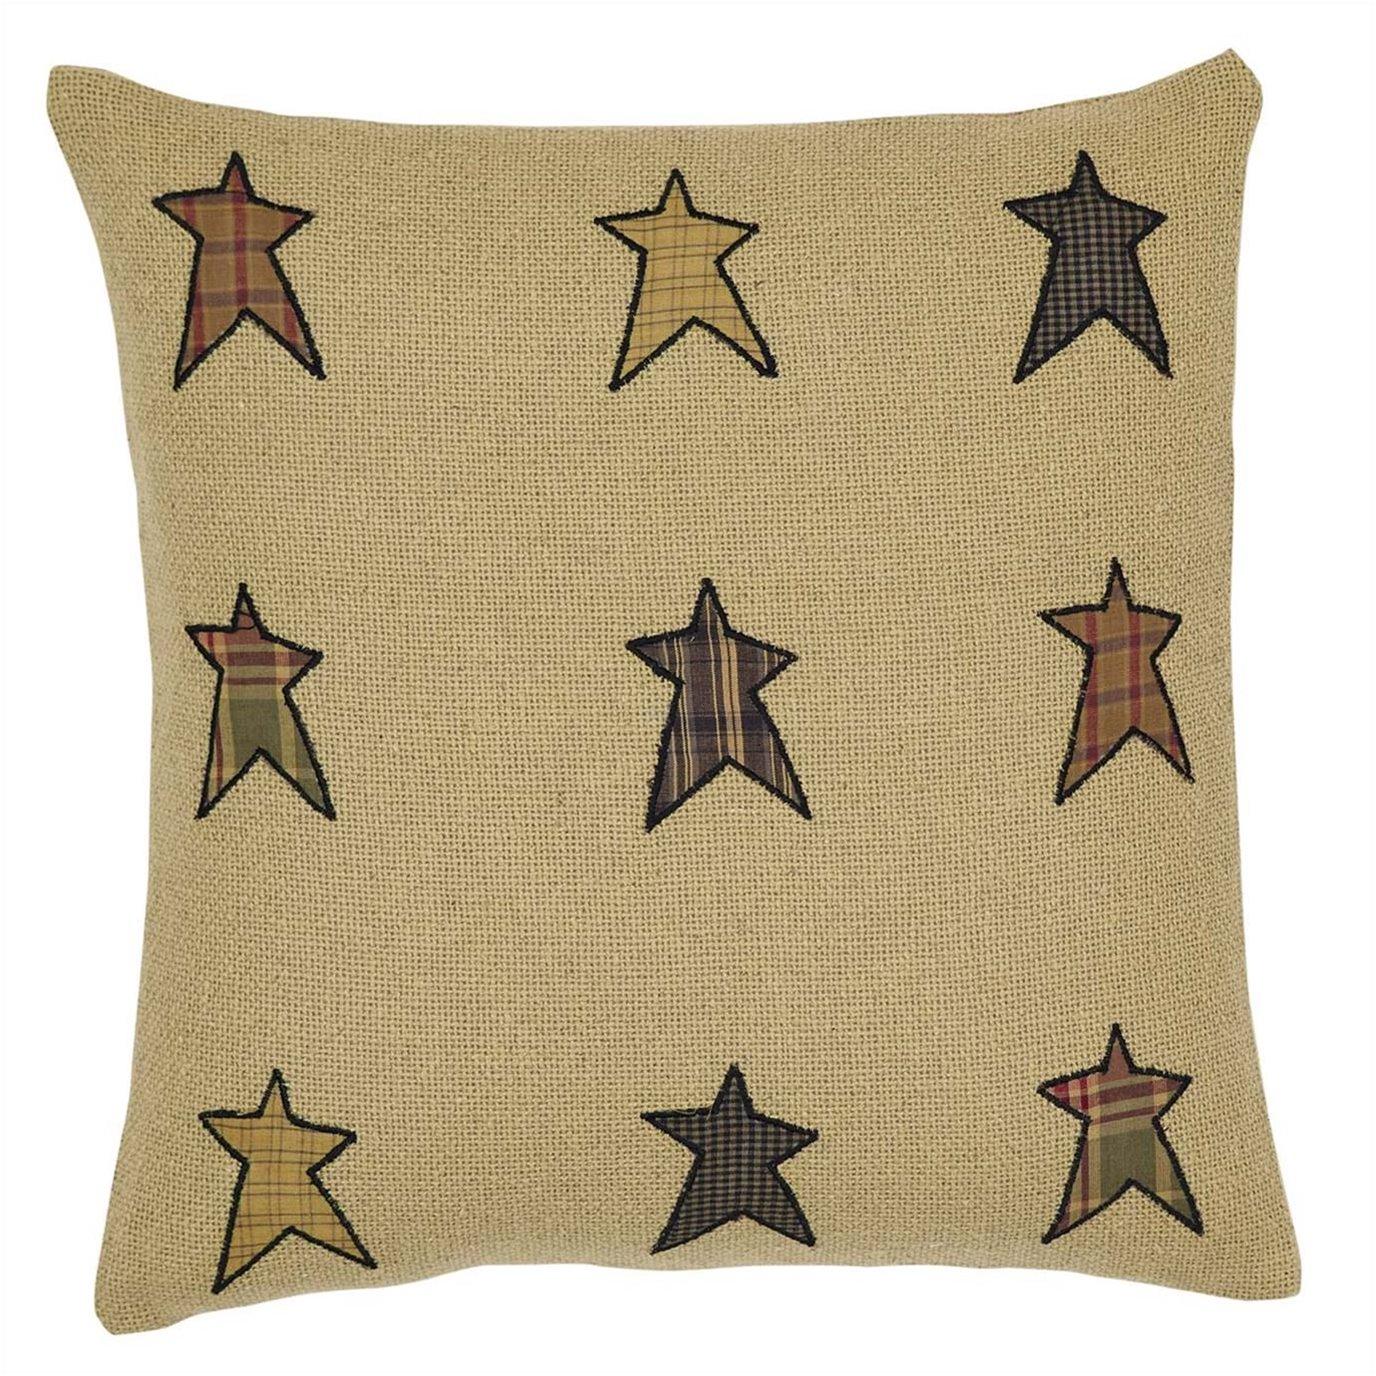 Stratton Applique Star Pillow 16x16